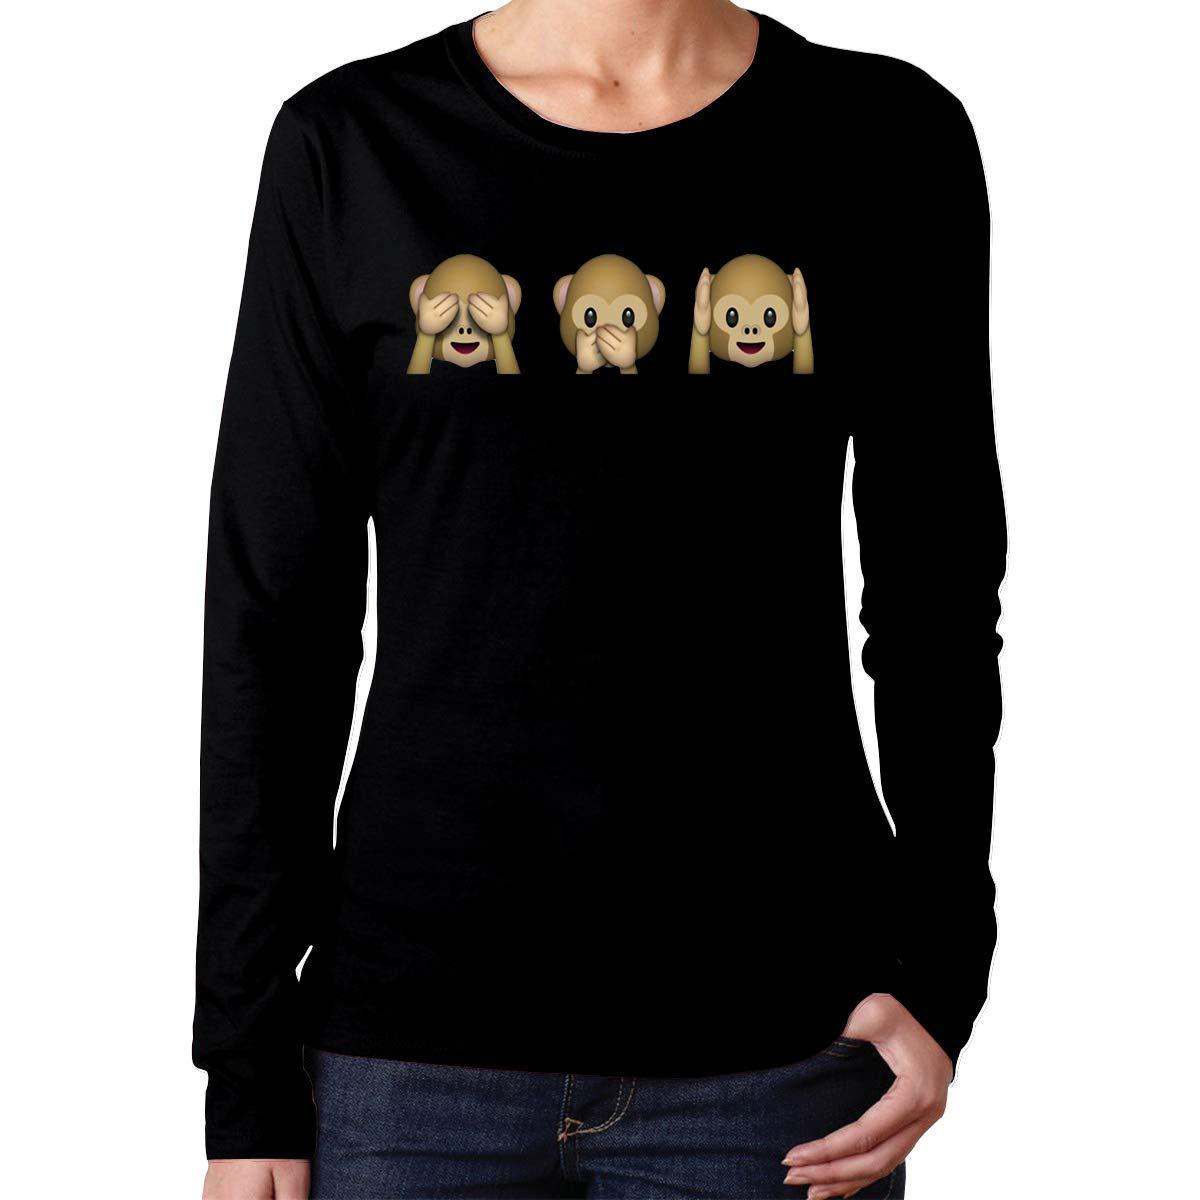 Sitox Cute Monkey See No Evil Tees Black Shirts